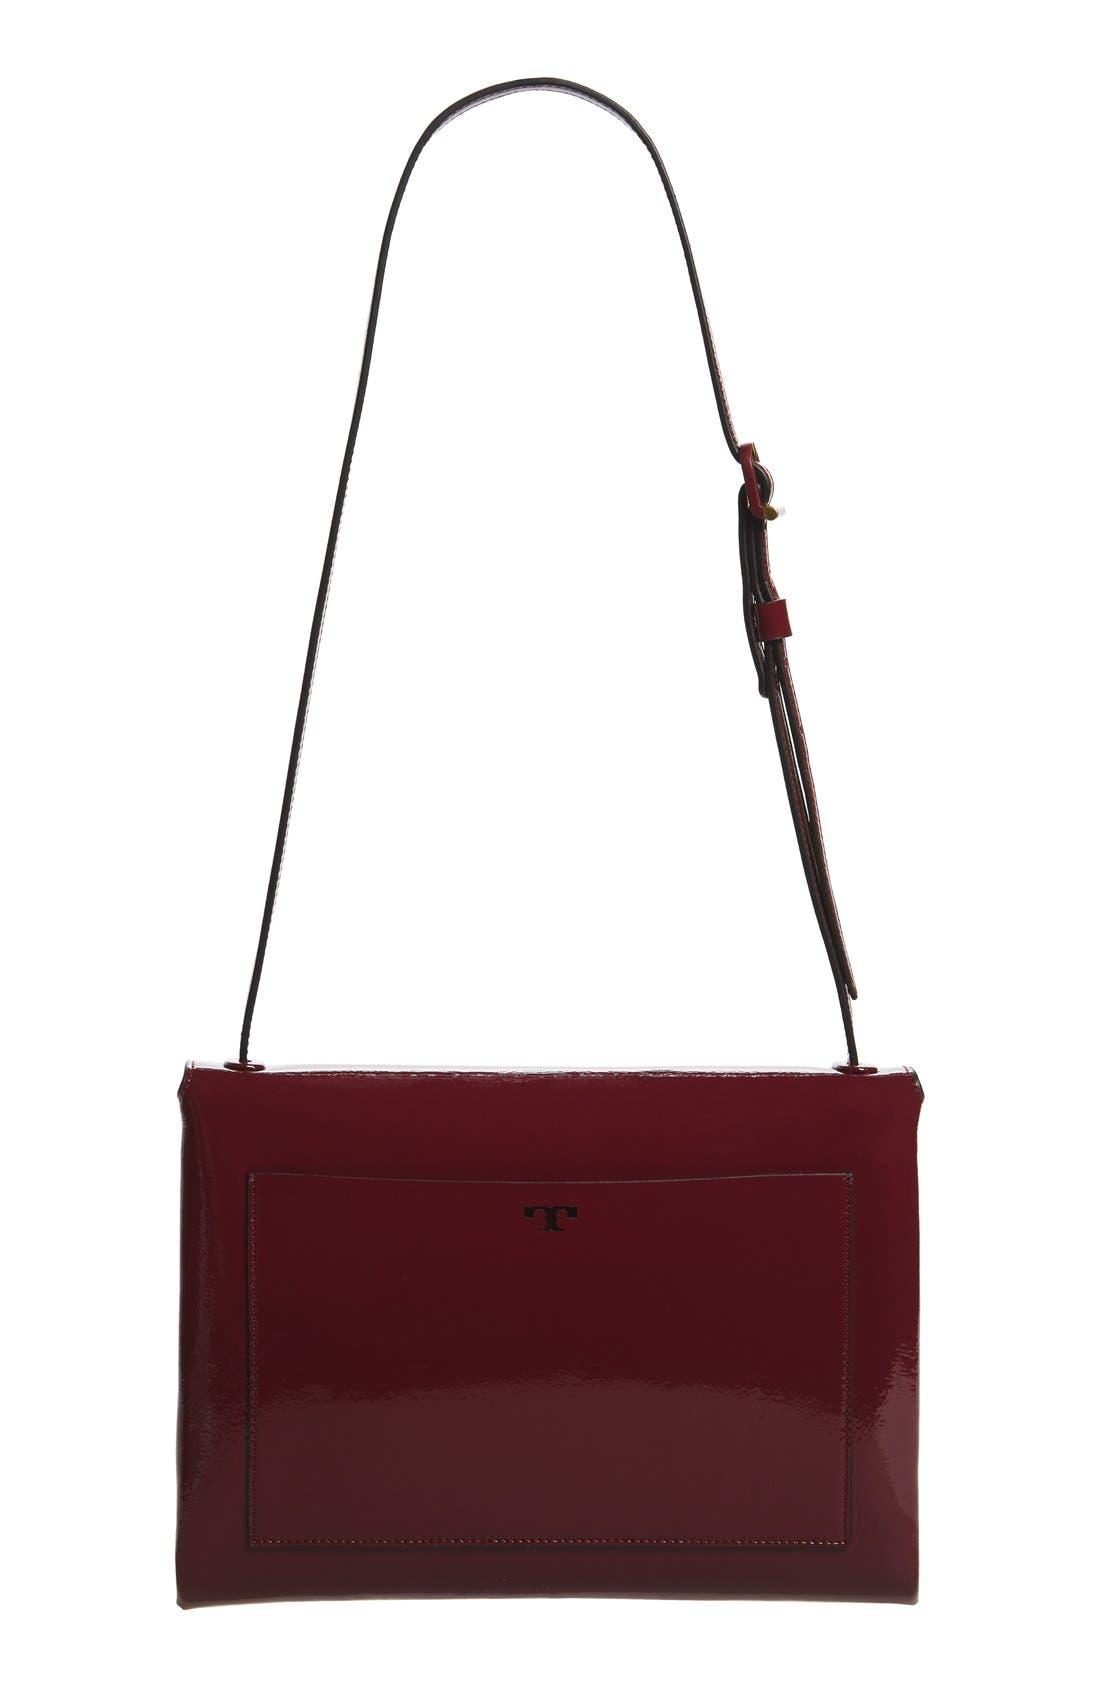 Patent Leather Convertible Shoulder Bag,                             Alternate thumbnail 6, color,                             606